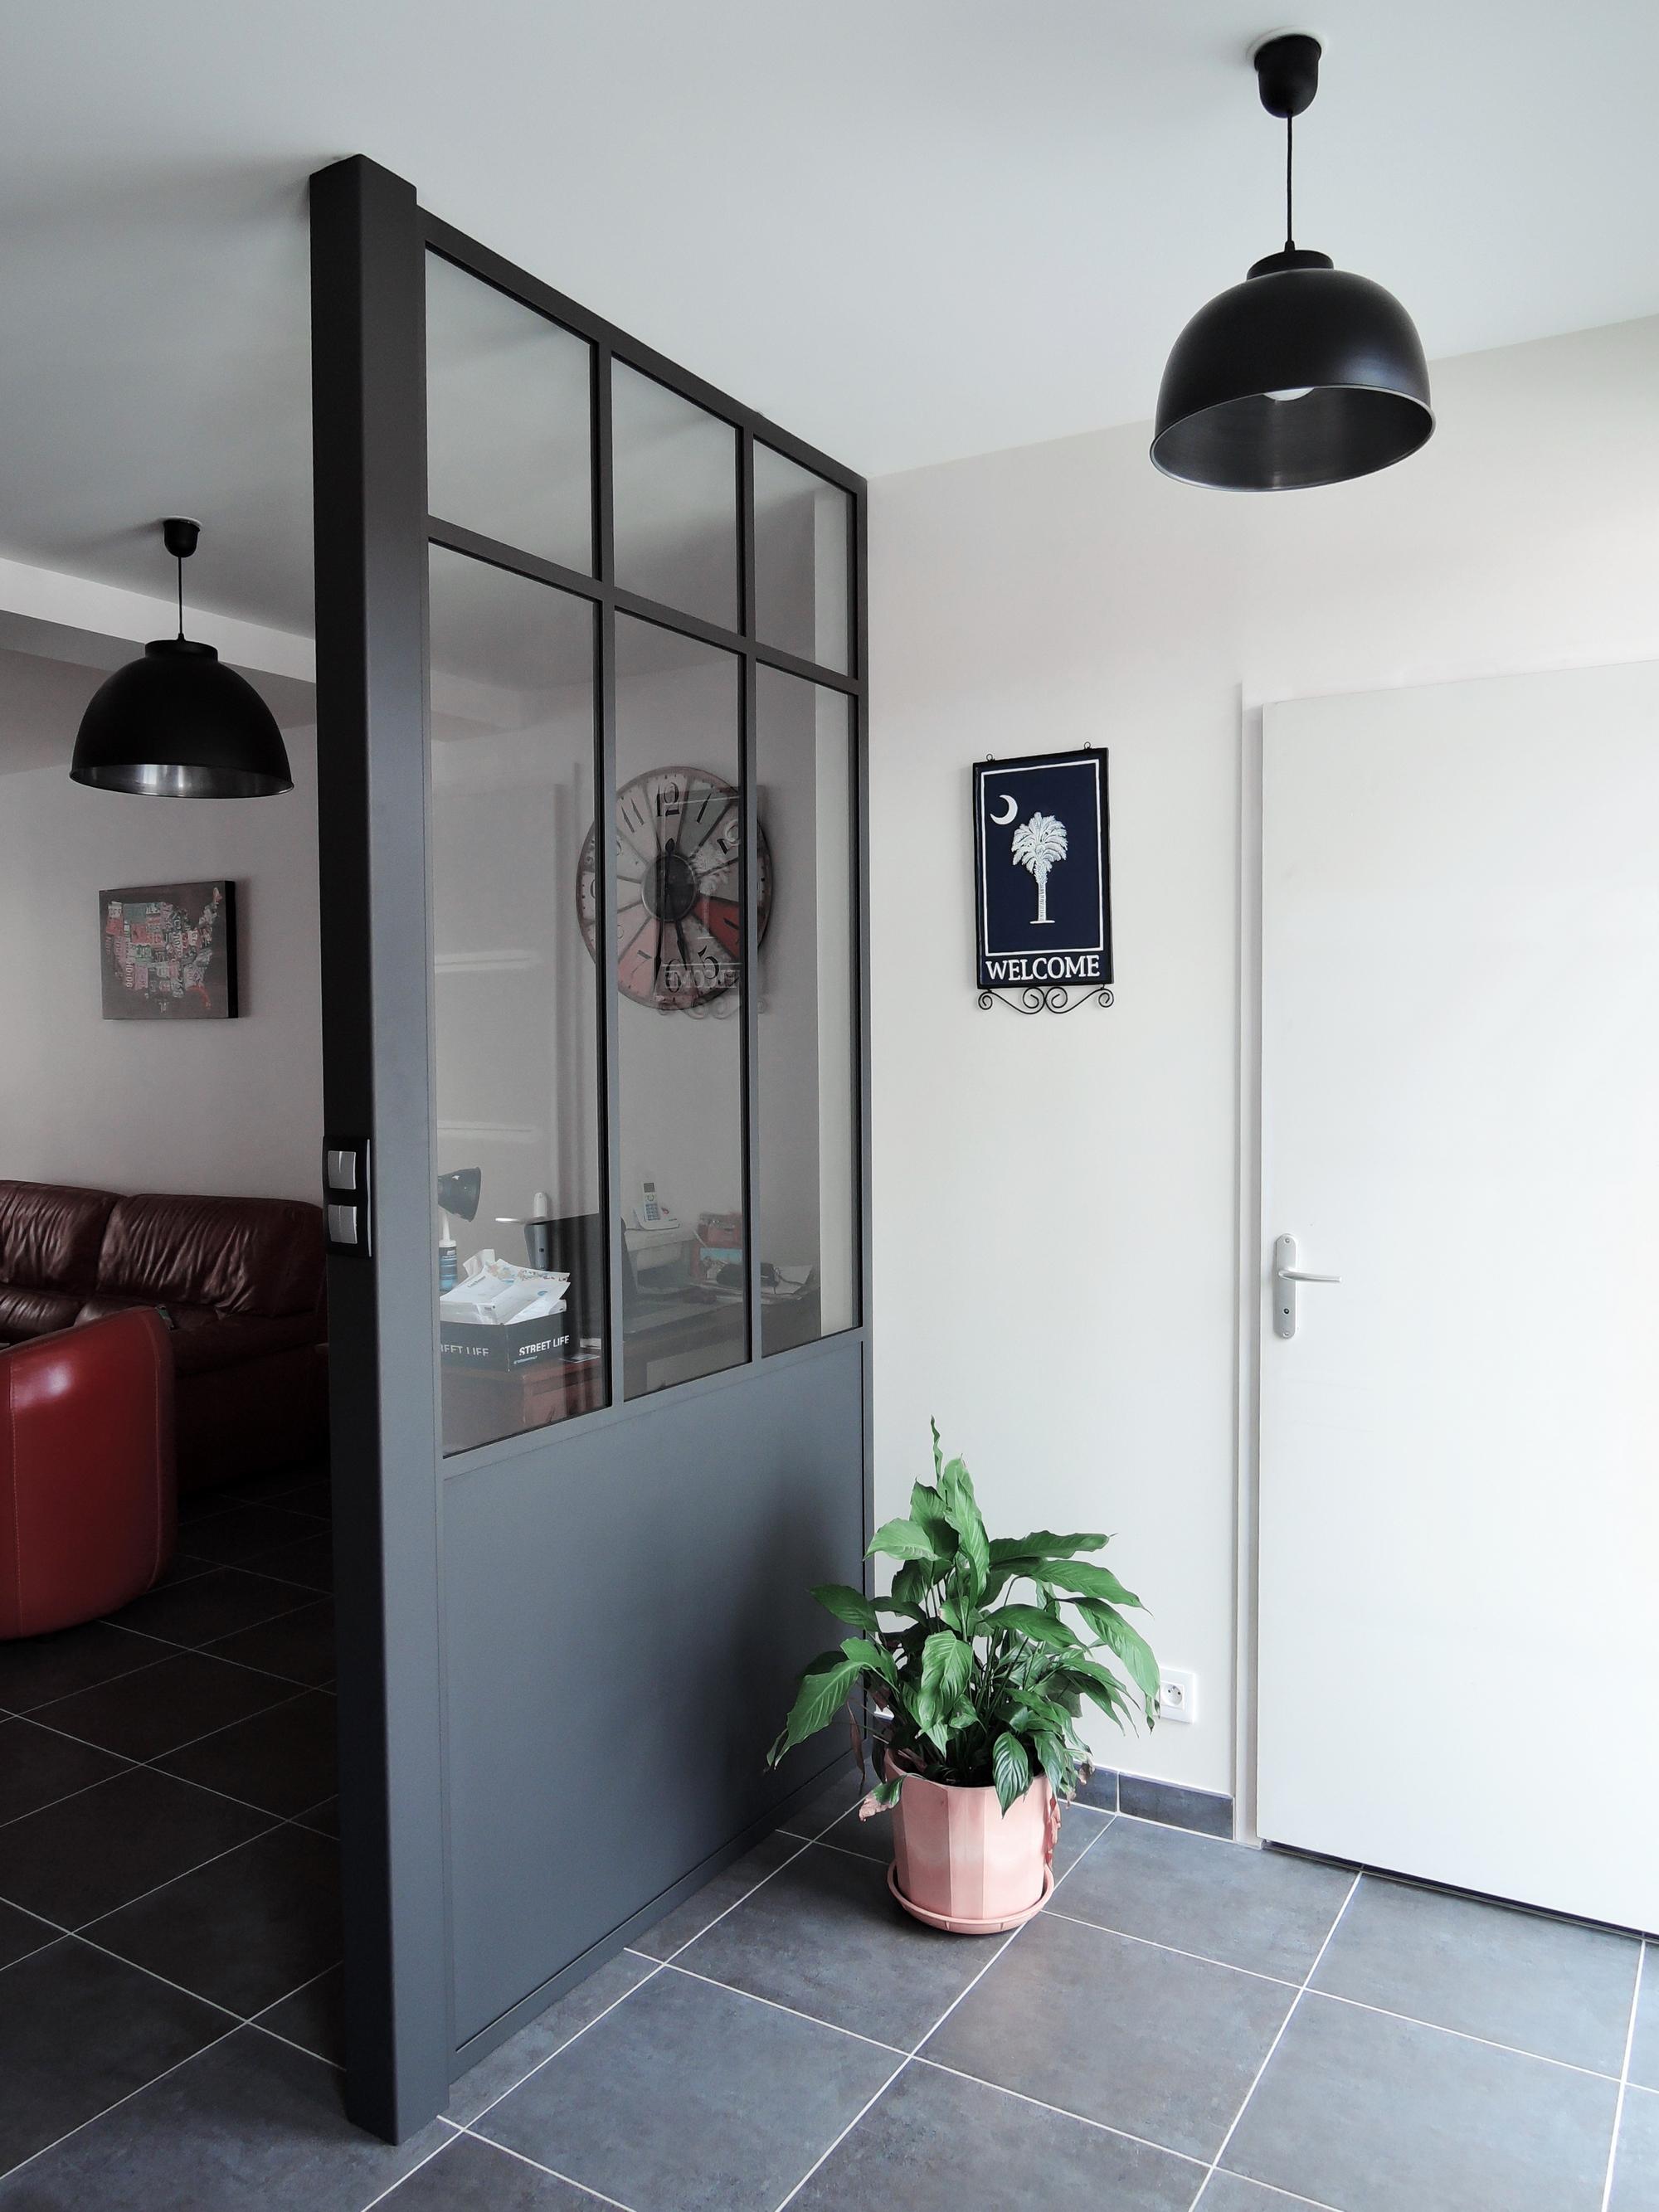 verri re 1 trav e acier fabrication artisanale fran aise sur mesure. Black Bedroom Furniture Sets. Home Design Ideas